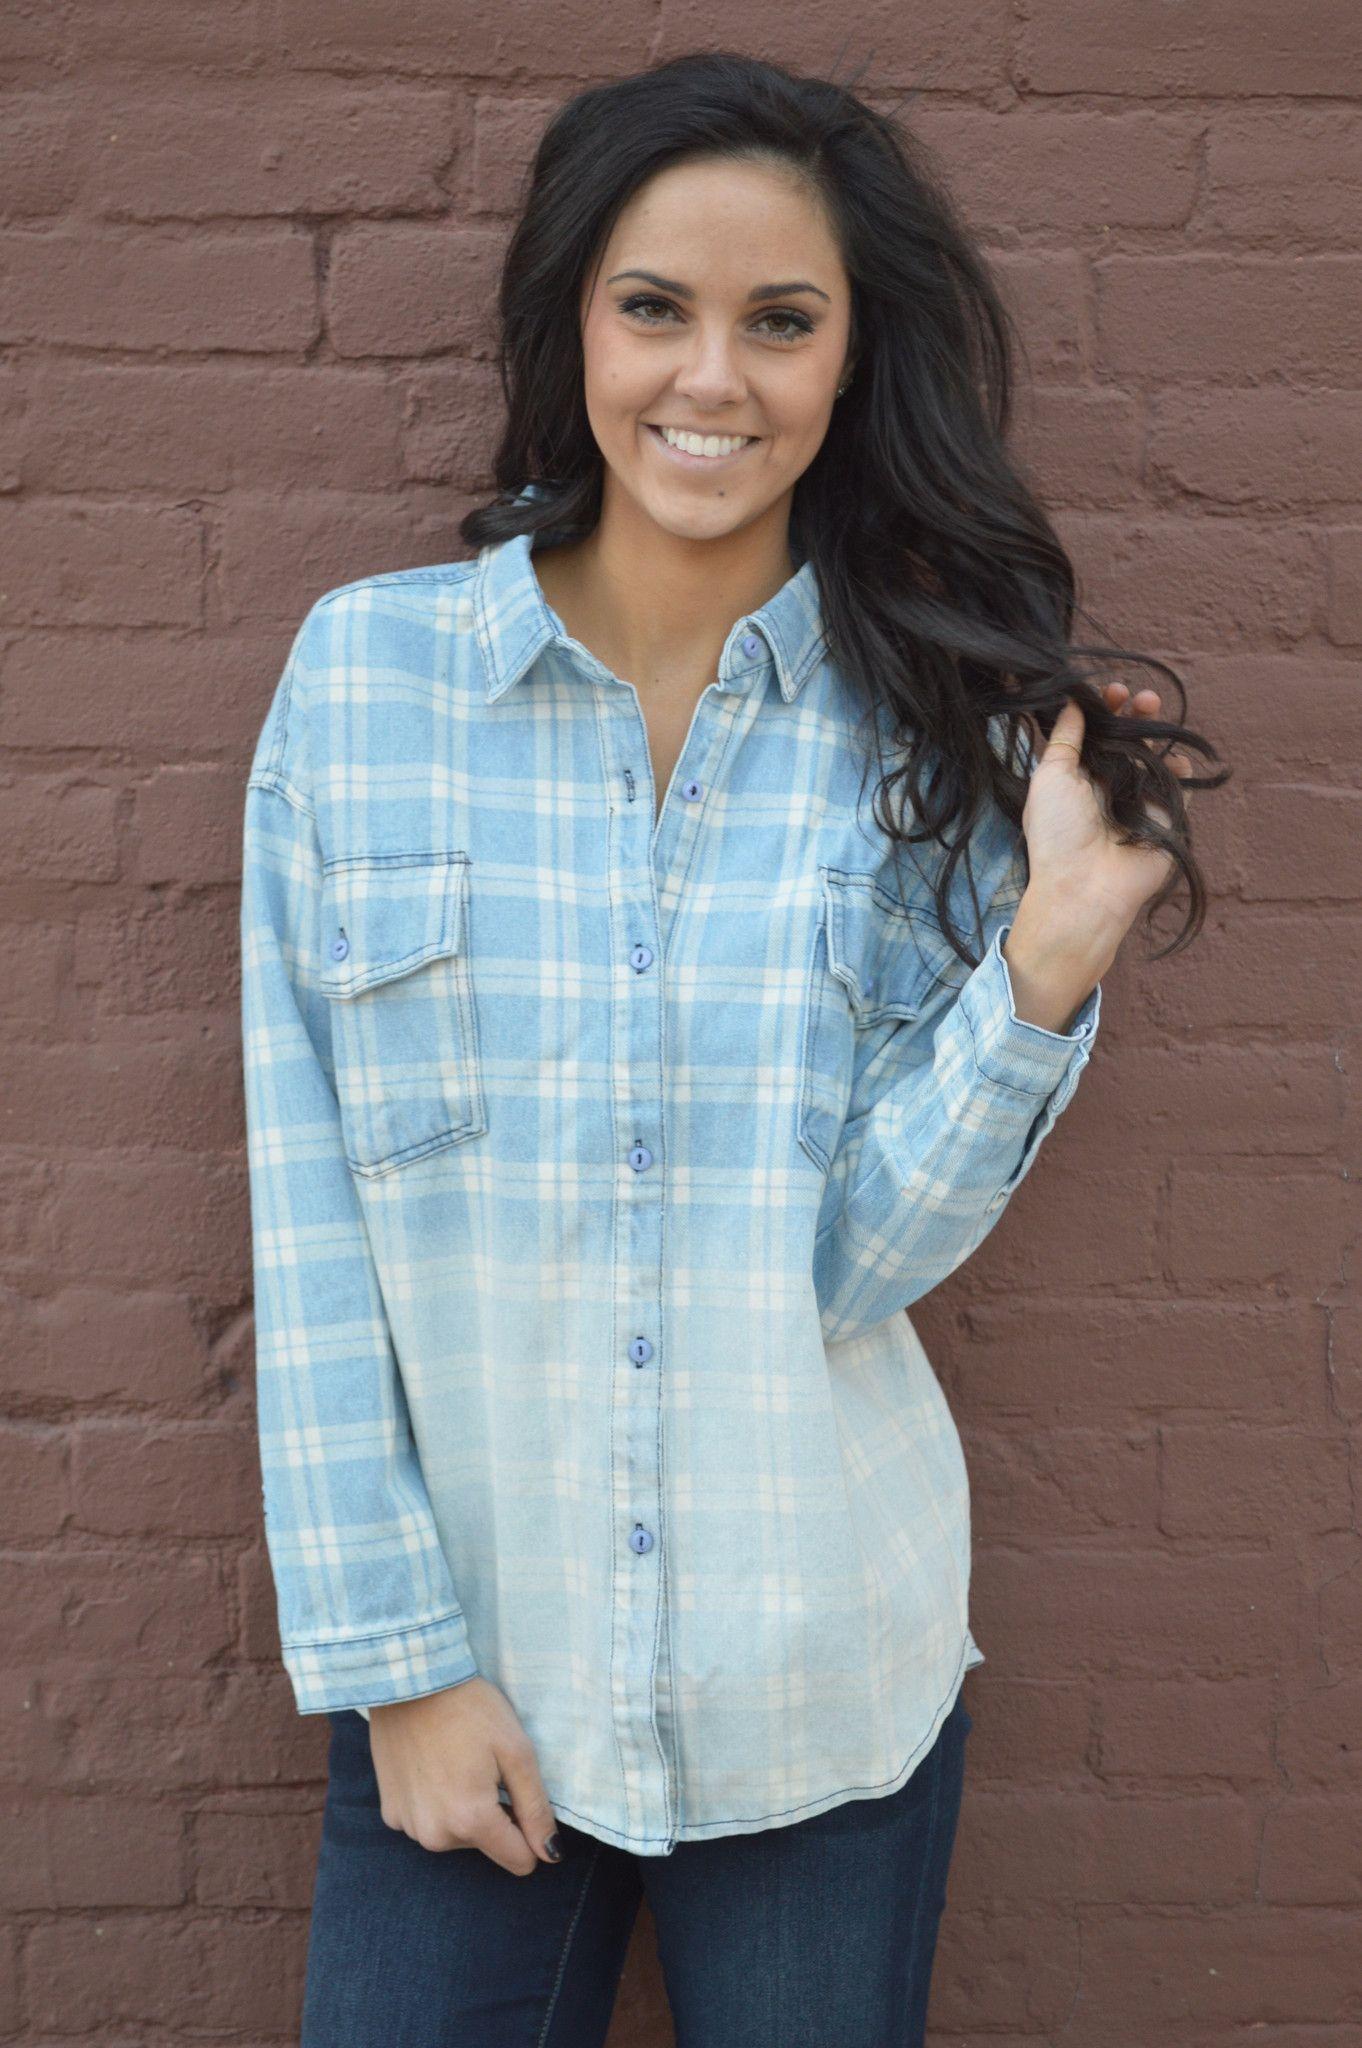 Zara flannel shirt mens  Ombre Denim Shirt from Shop Southern Roots TX  デニム  Pinterest